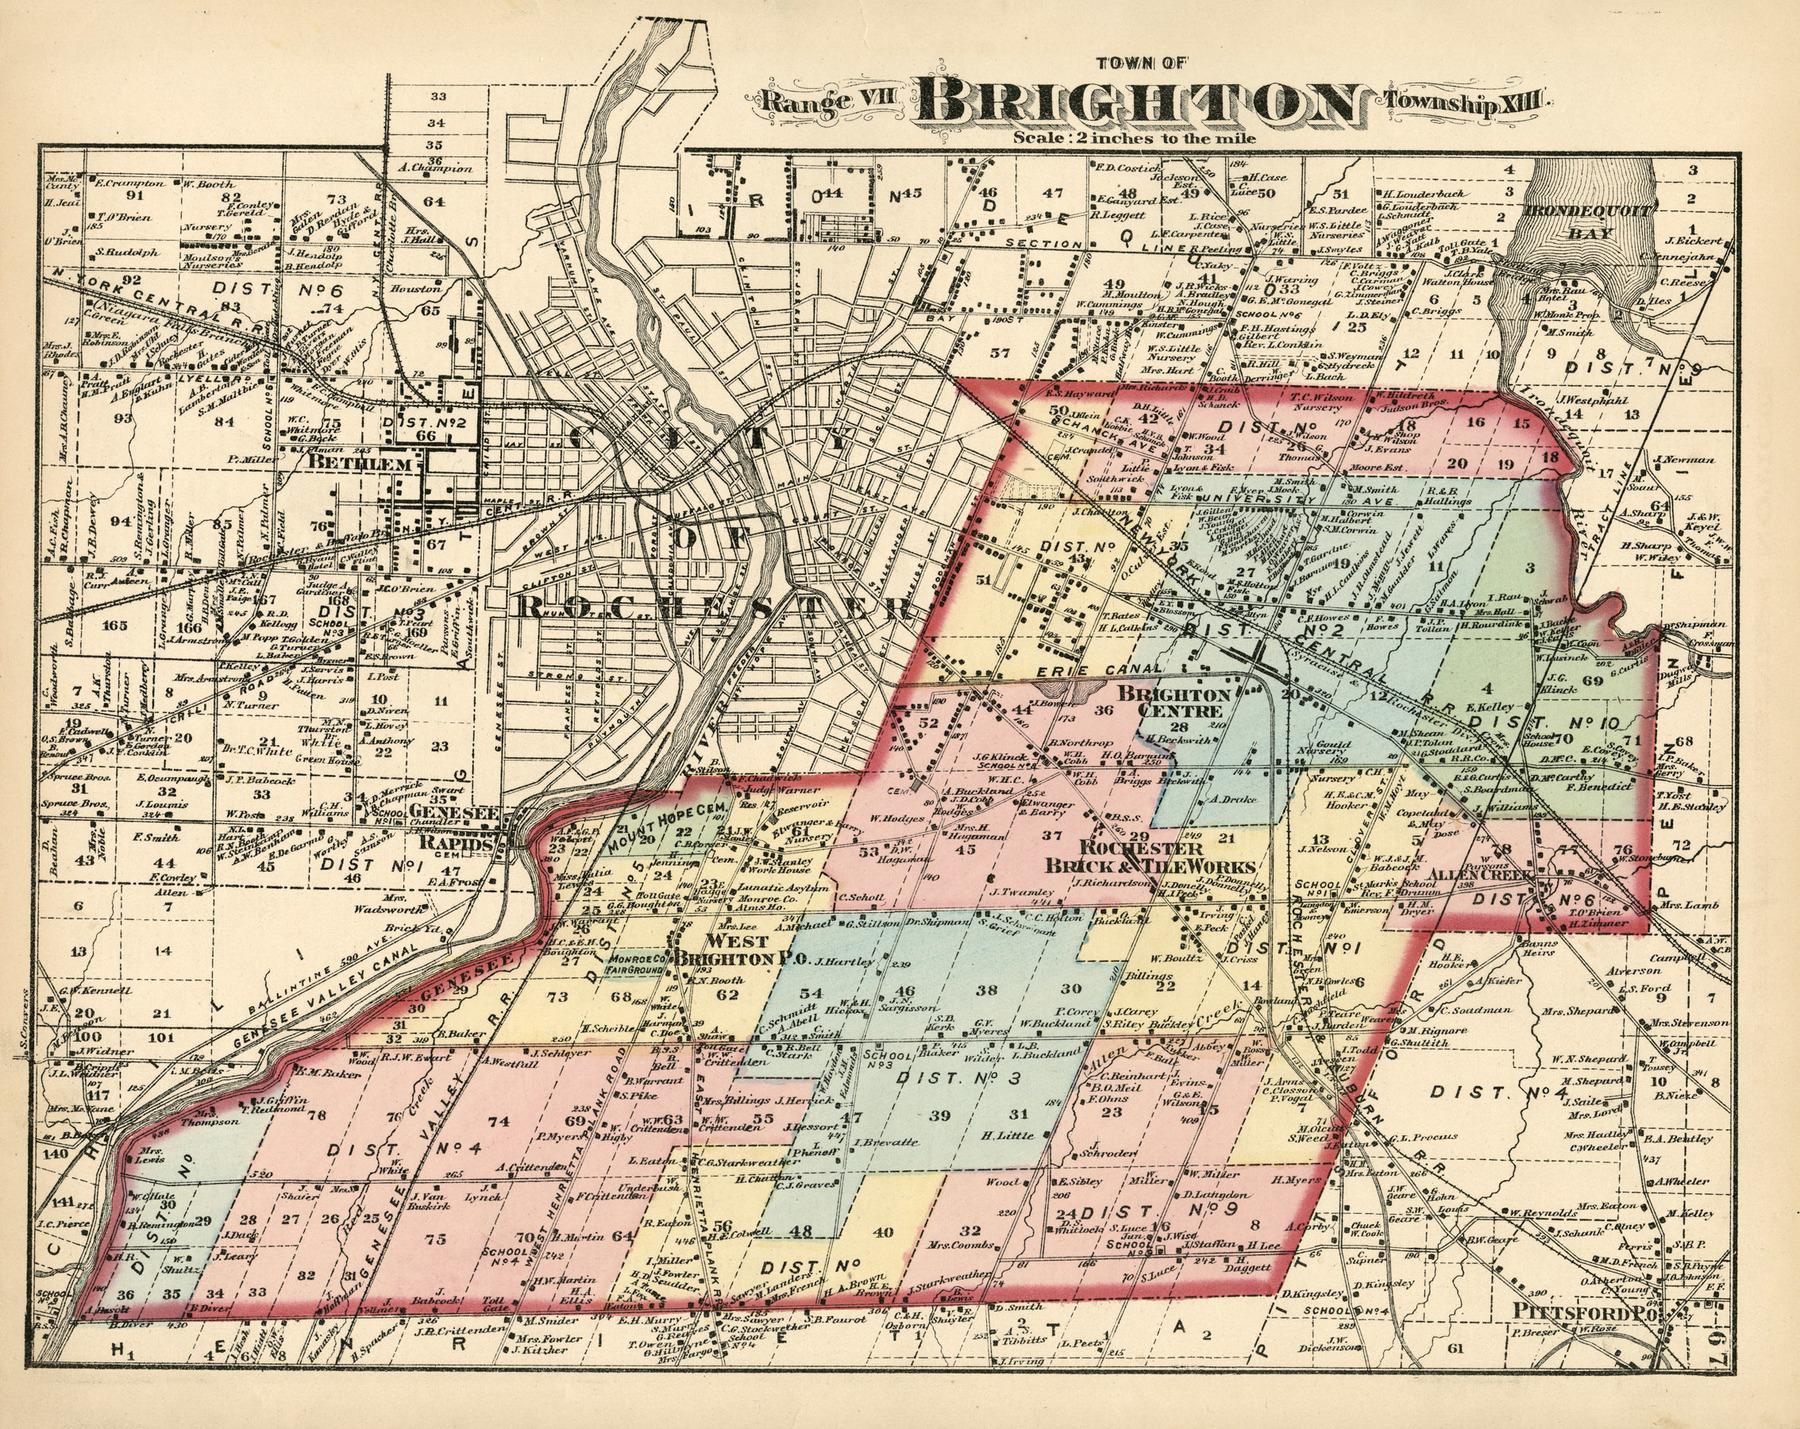 Atlas of Monroe Co., New York.